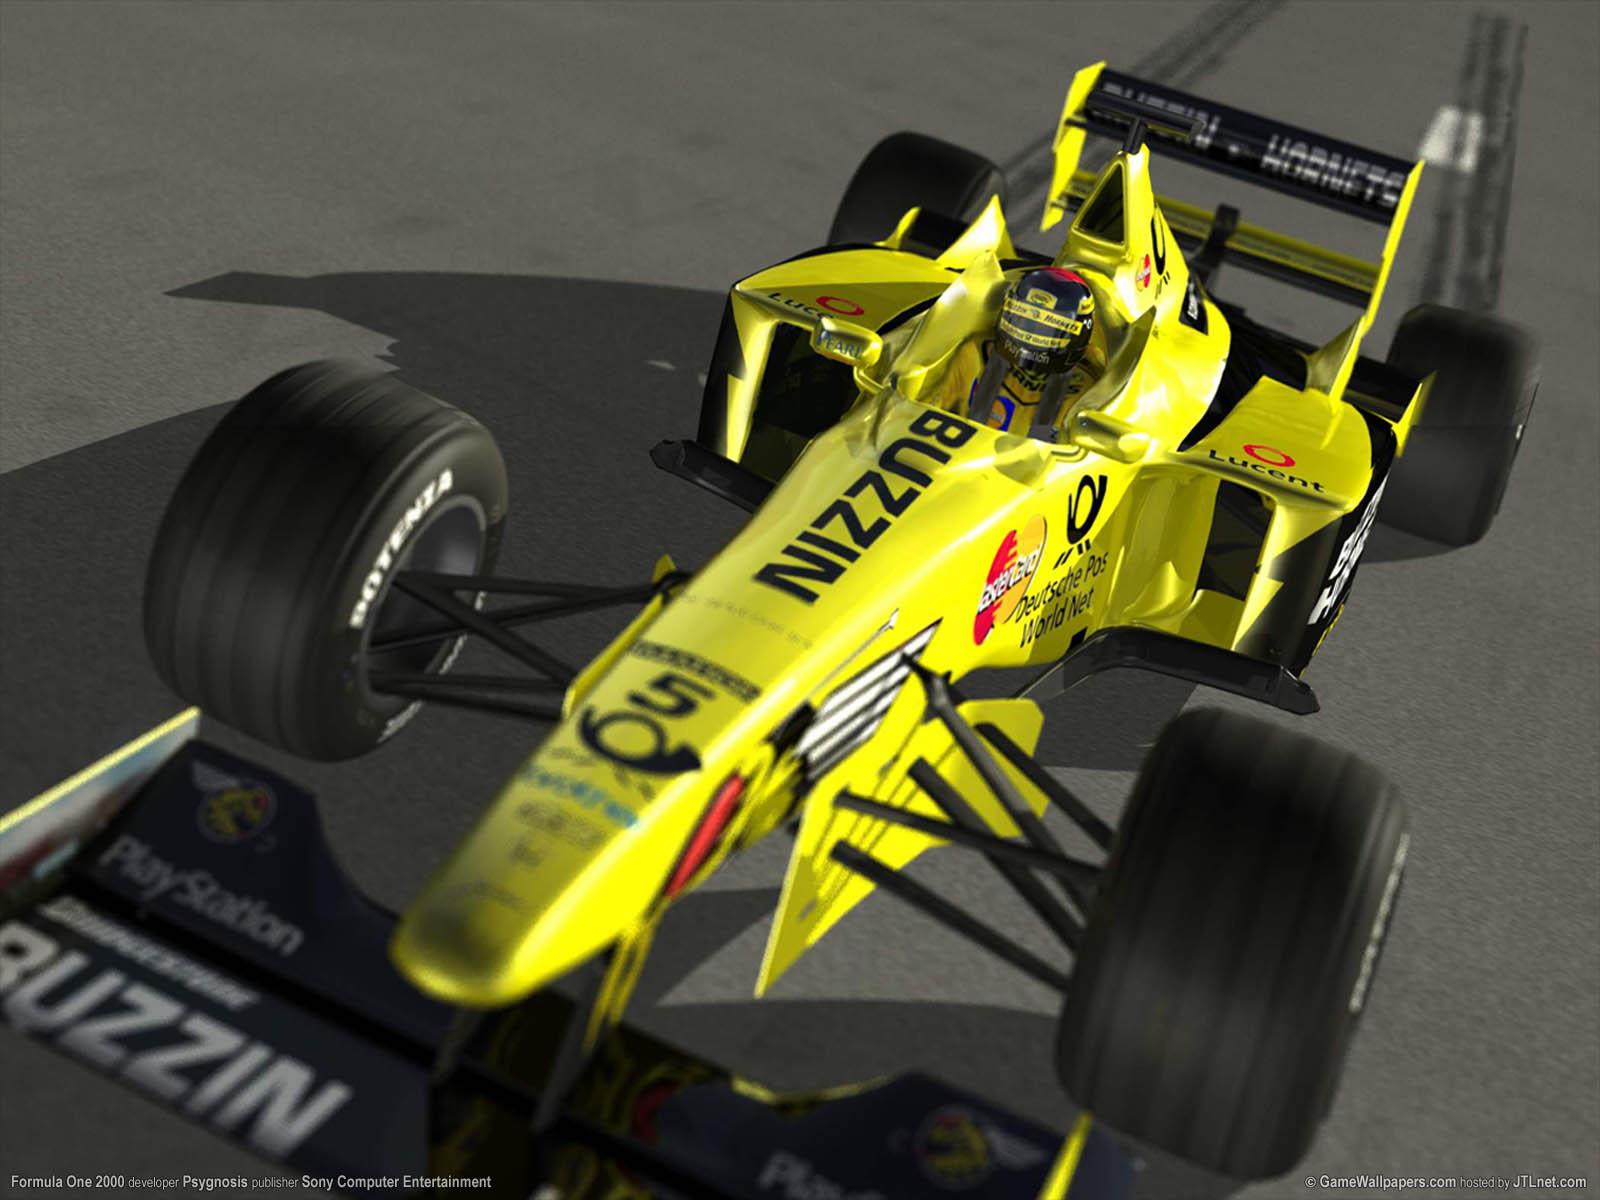 Formula One 2000 wallpaper 01 1600x1200